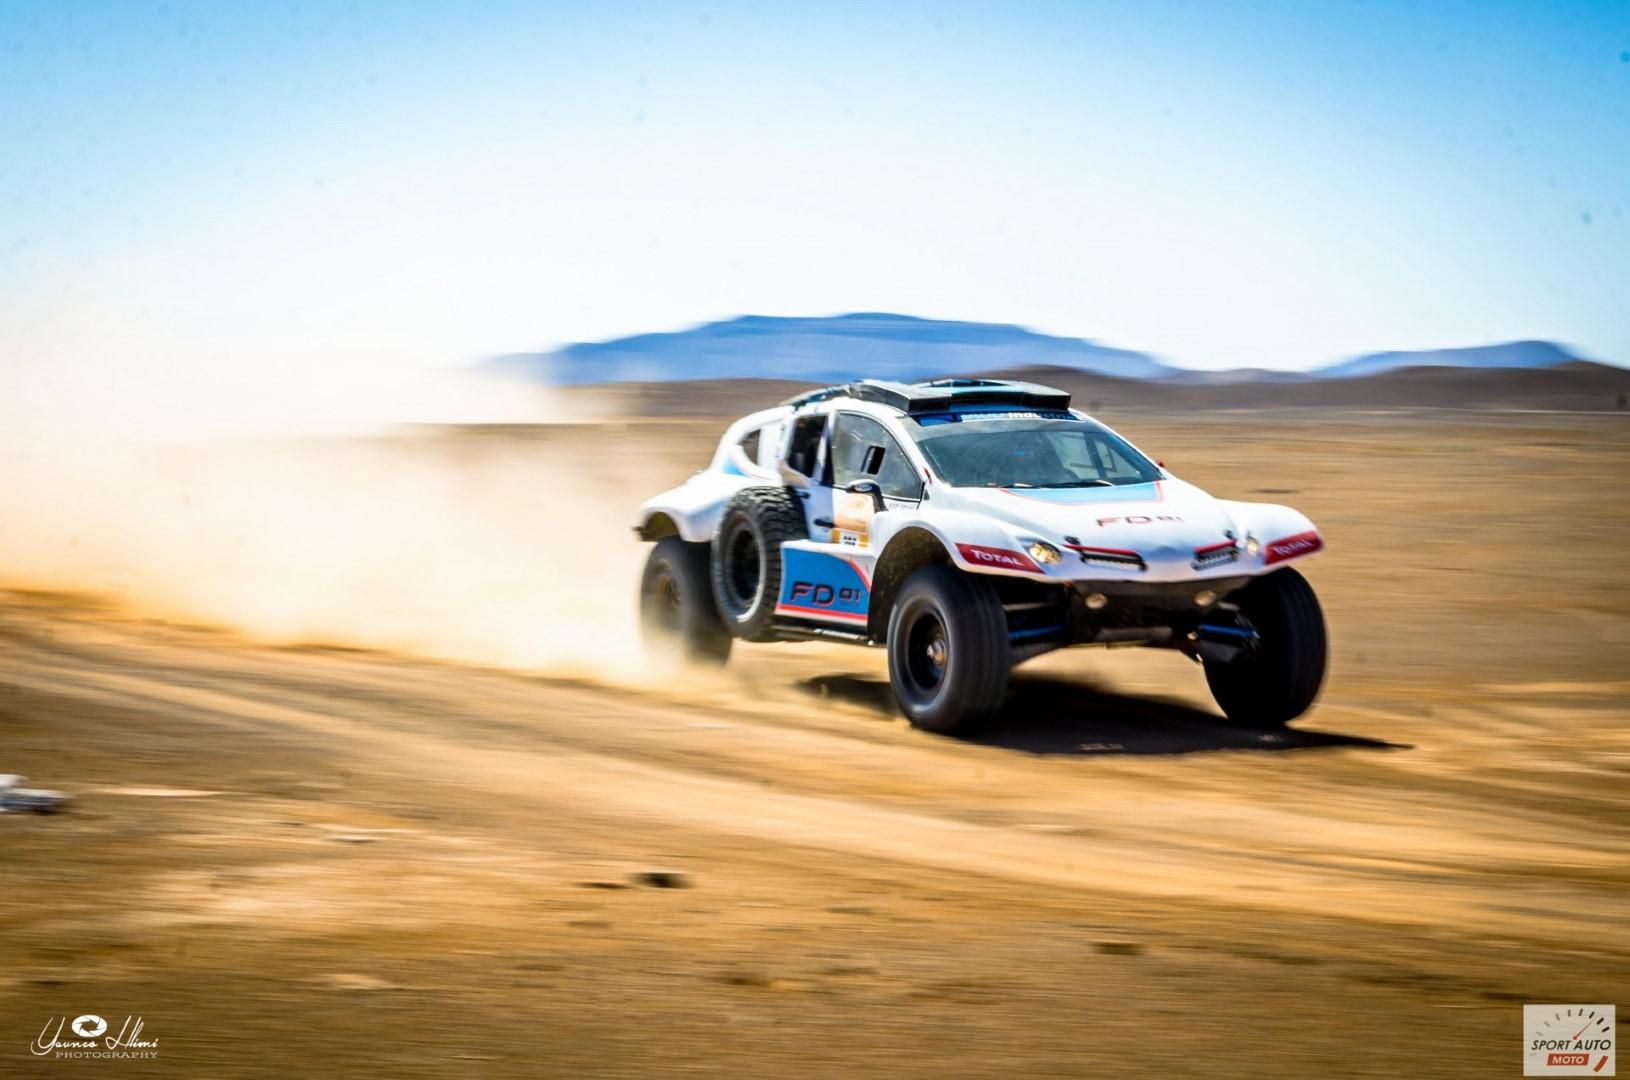 Rallye Hearts of Morocco 2017 : victoire de Lionel Baud sur la plus longue étape du rallye.